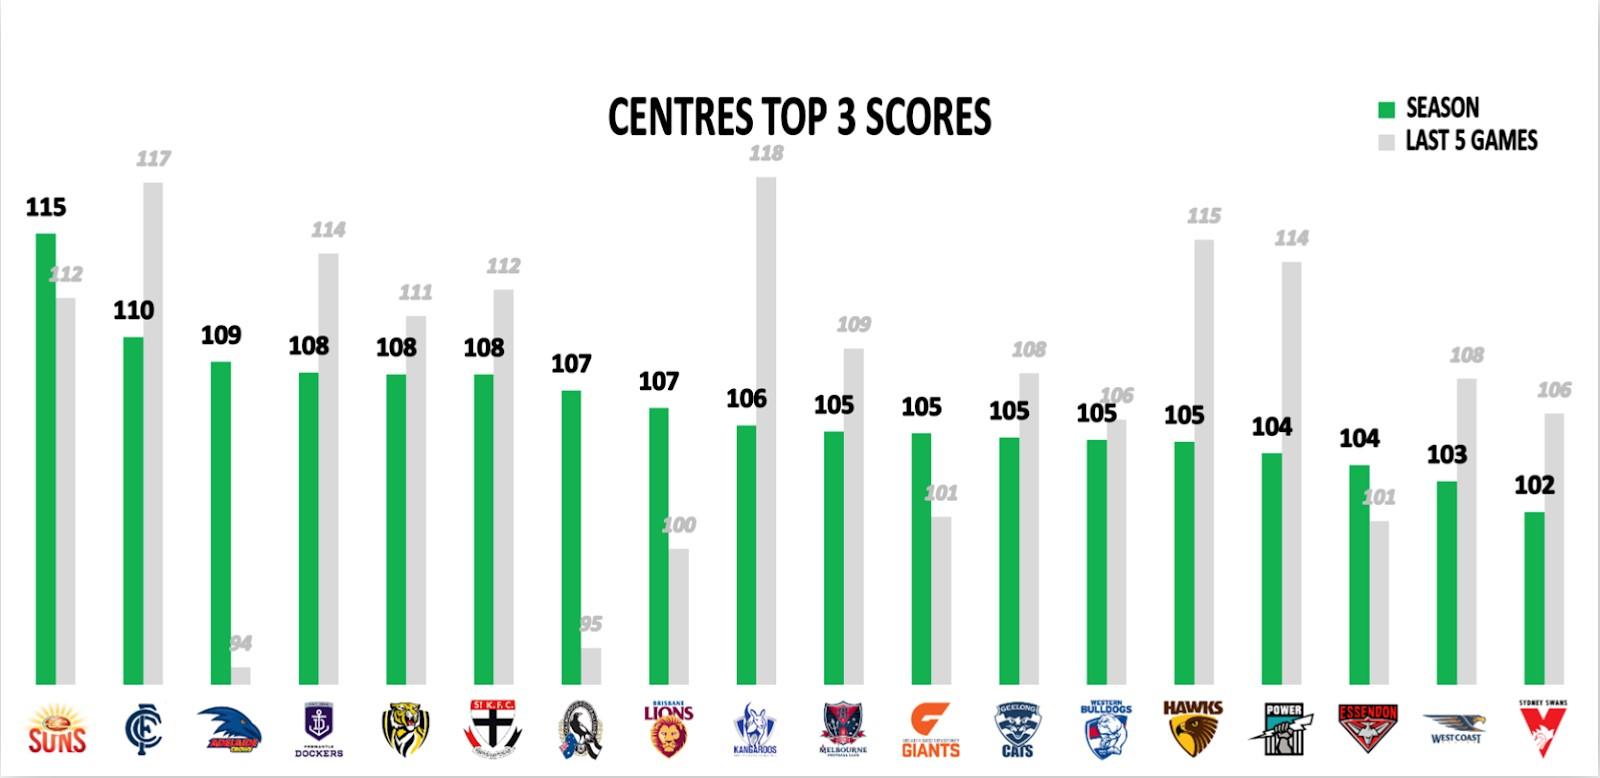 Points Against - Top 3 Centres